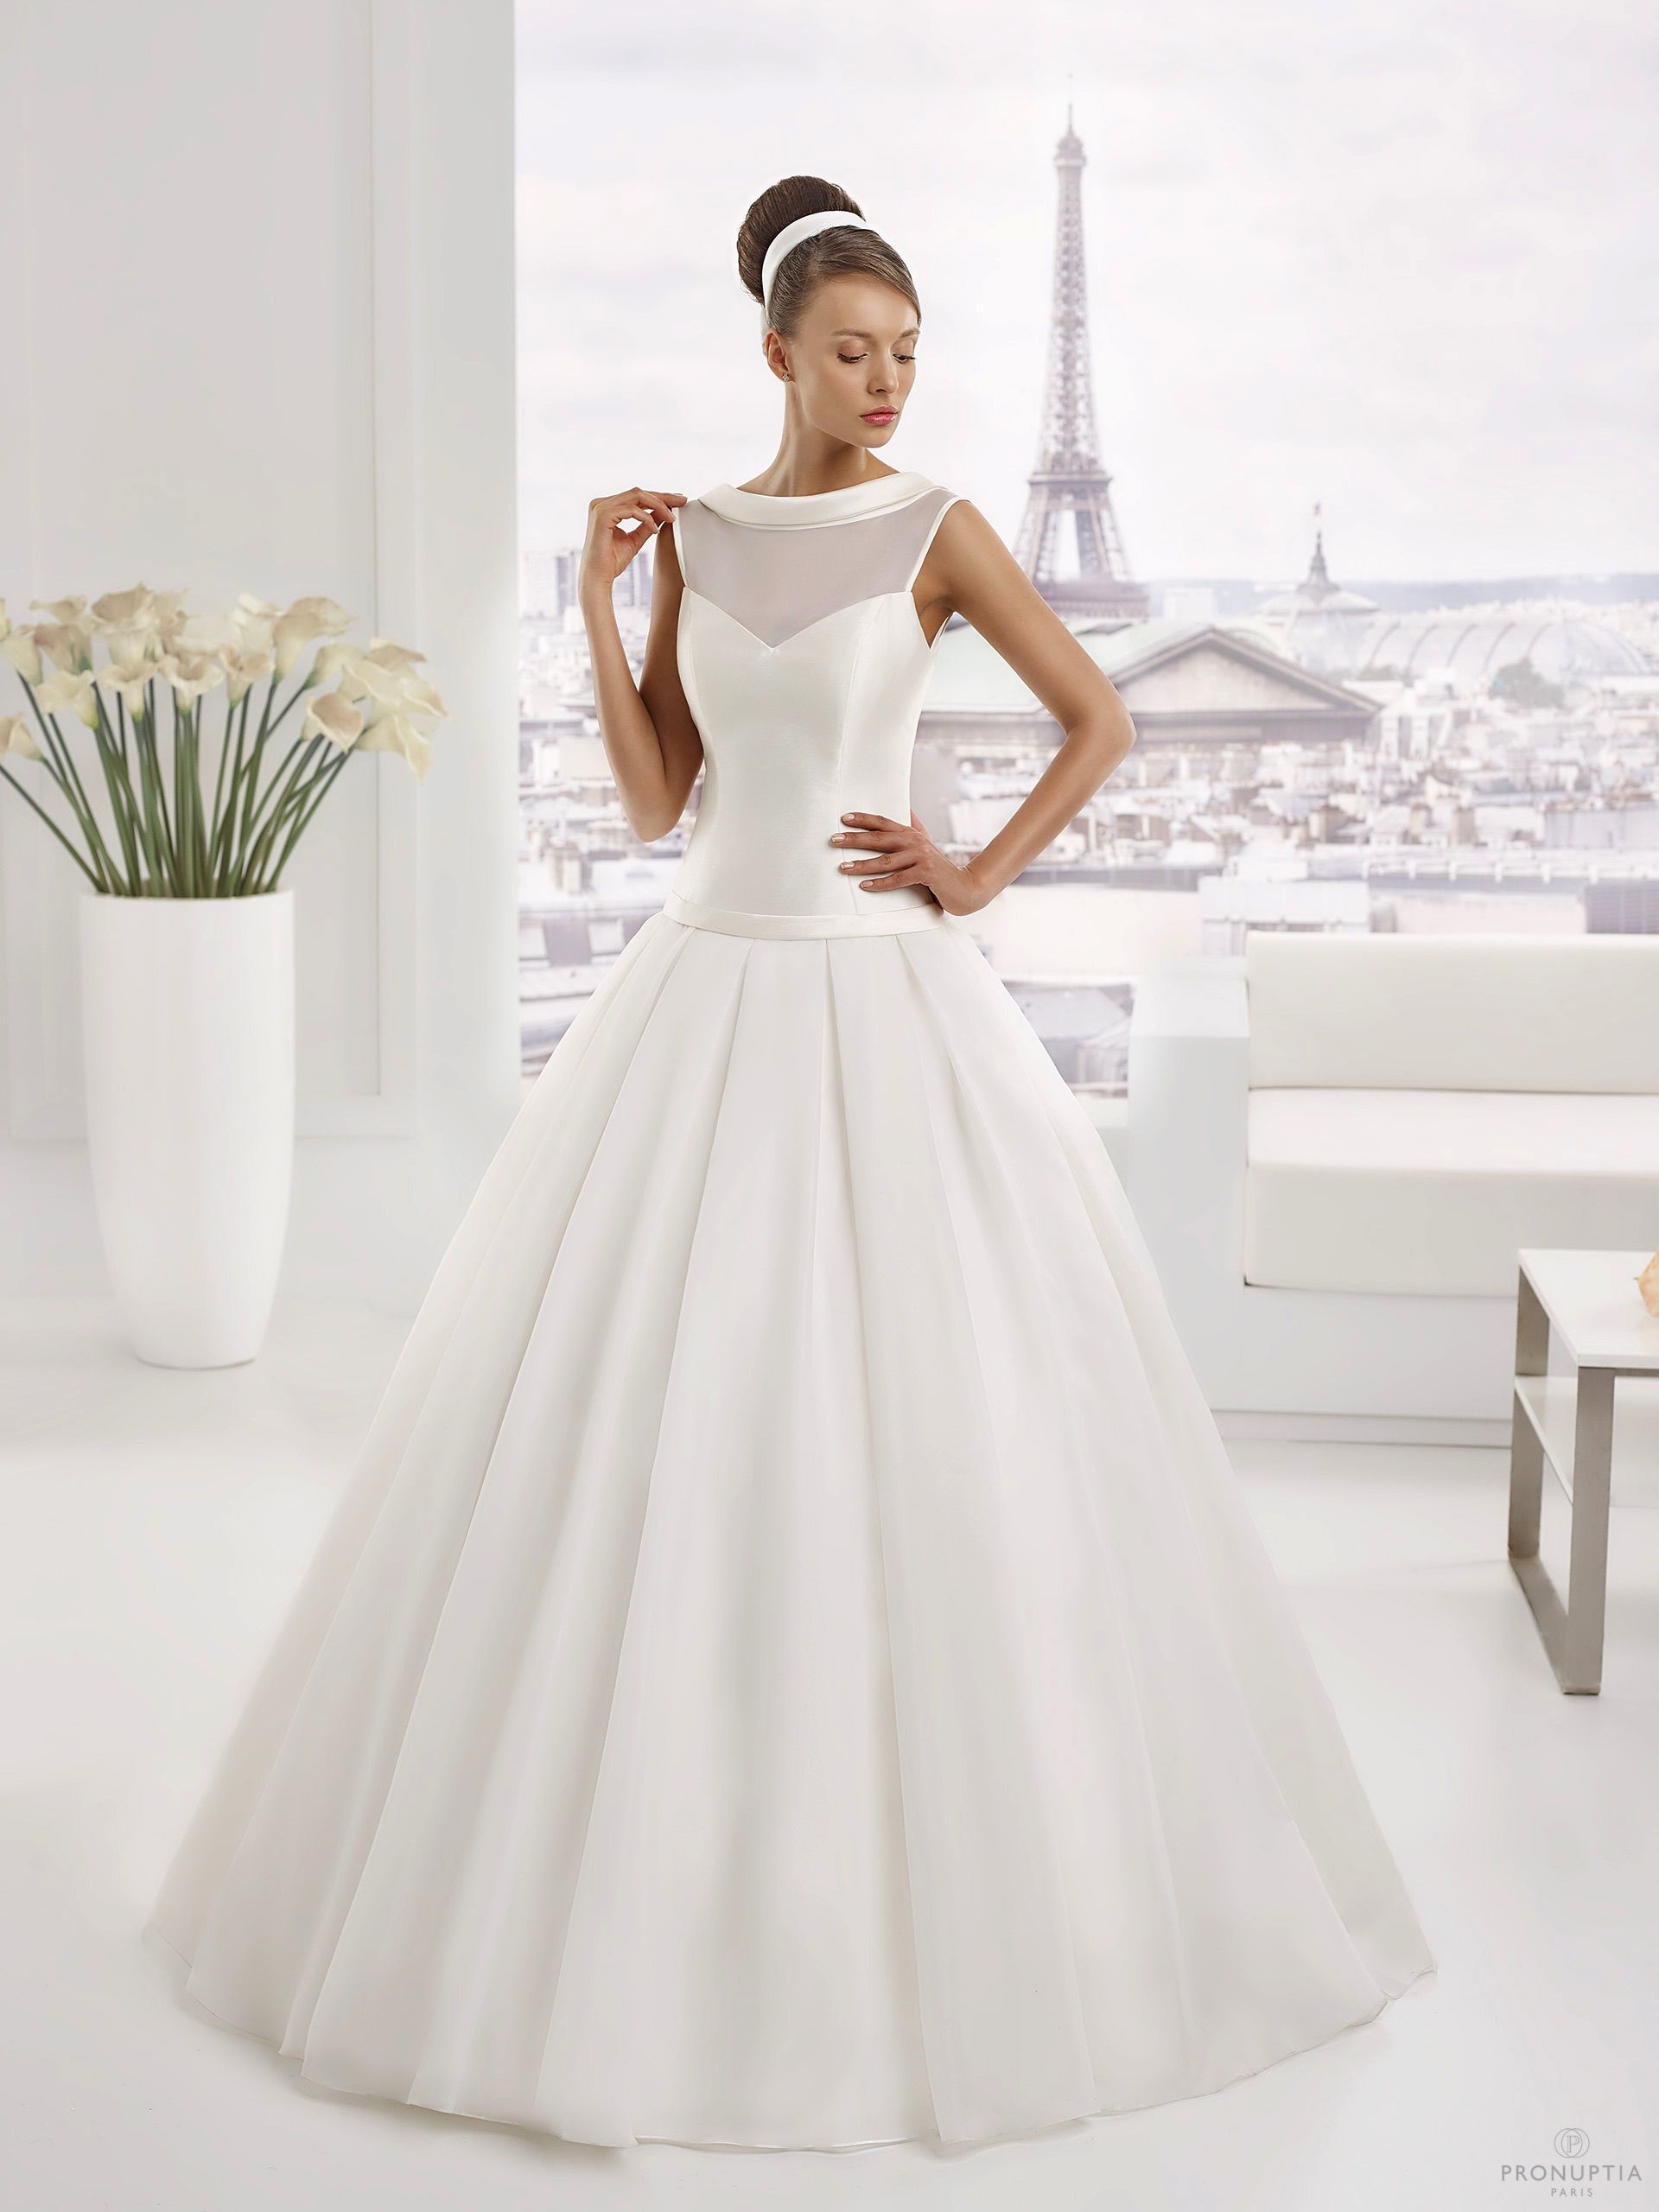 Robes de mariée Pronuptia, modèle Fabulite http://www.pronuptia.com/fr